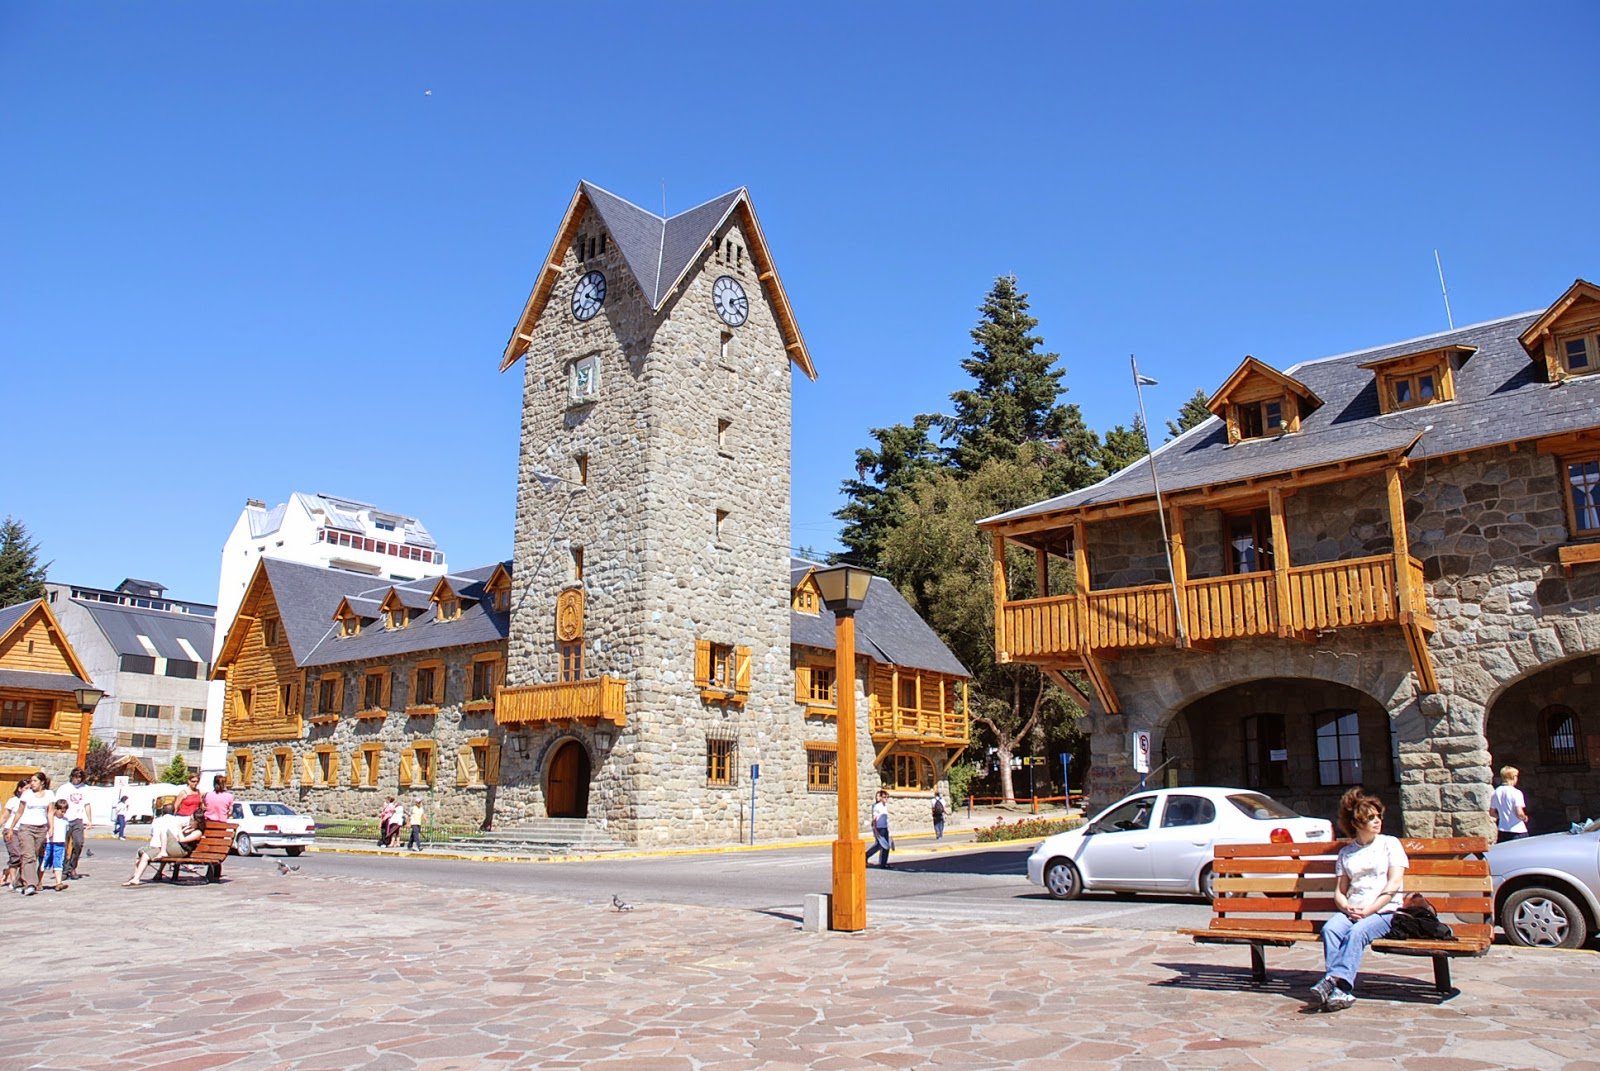 Turismo en Bariloche, Argentina